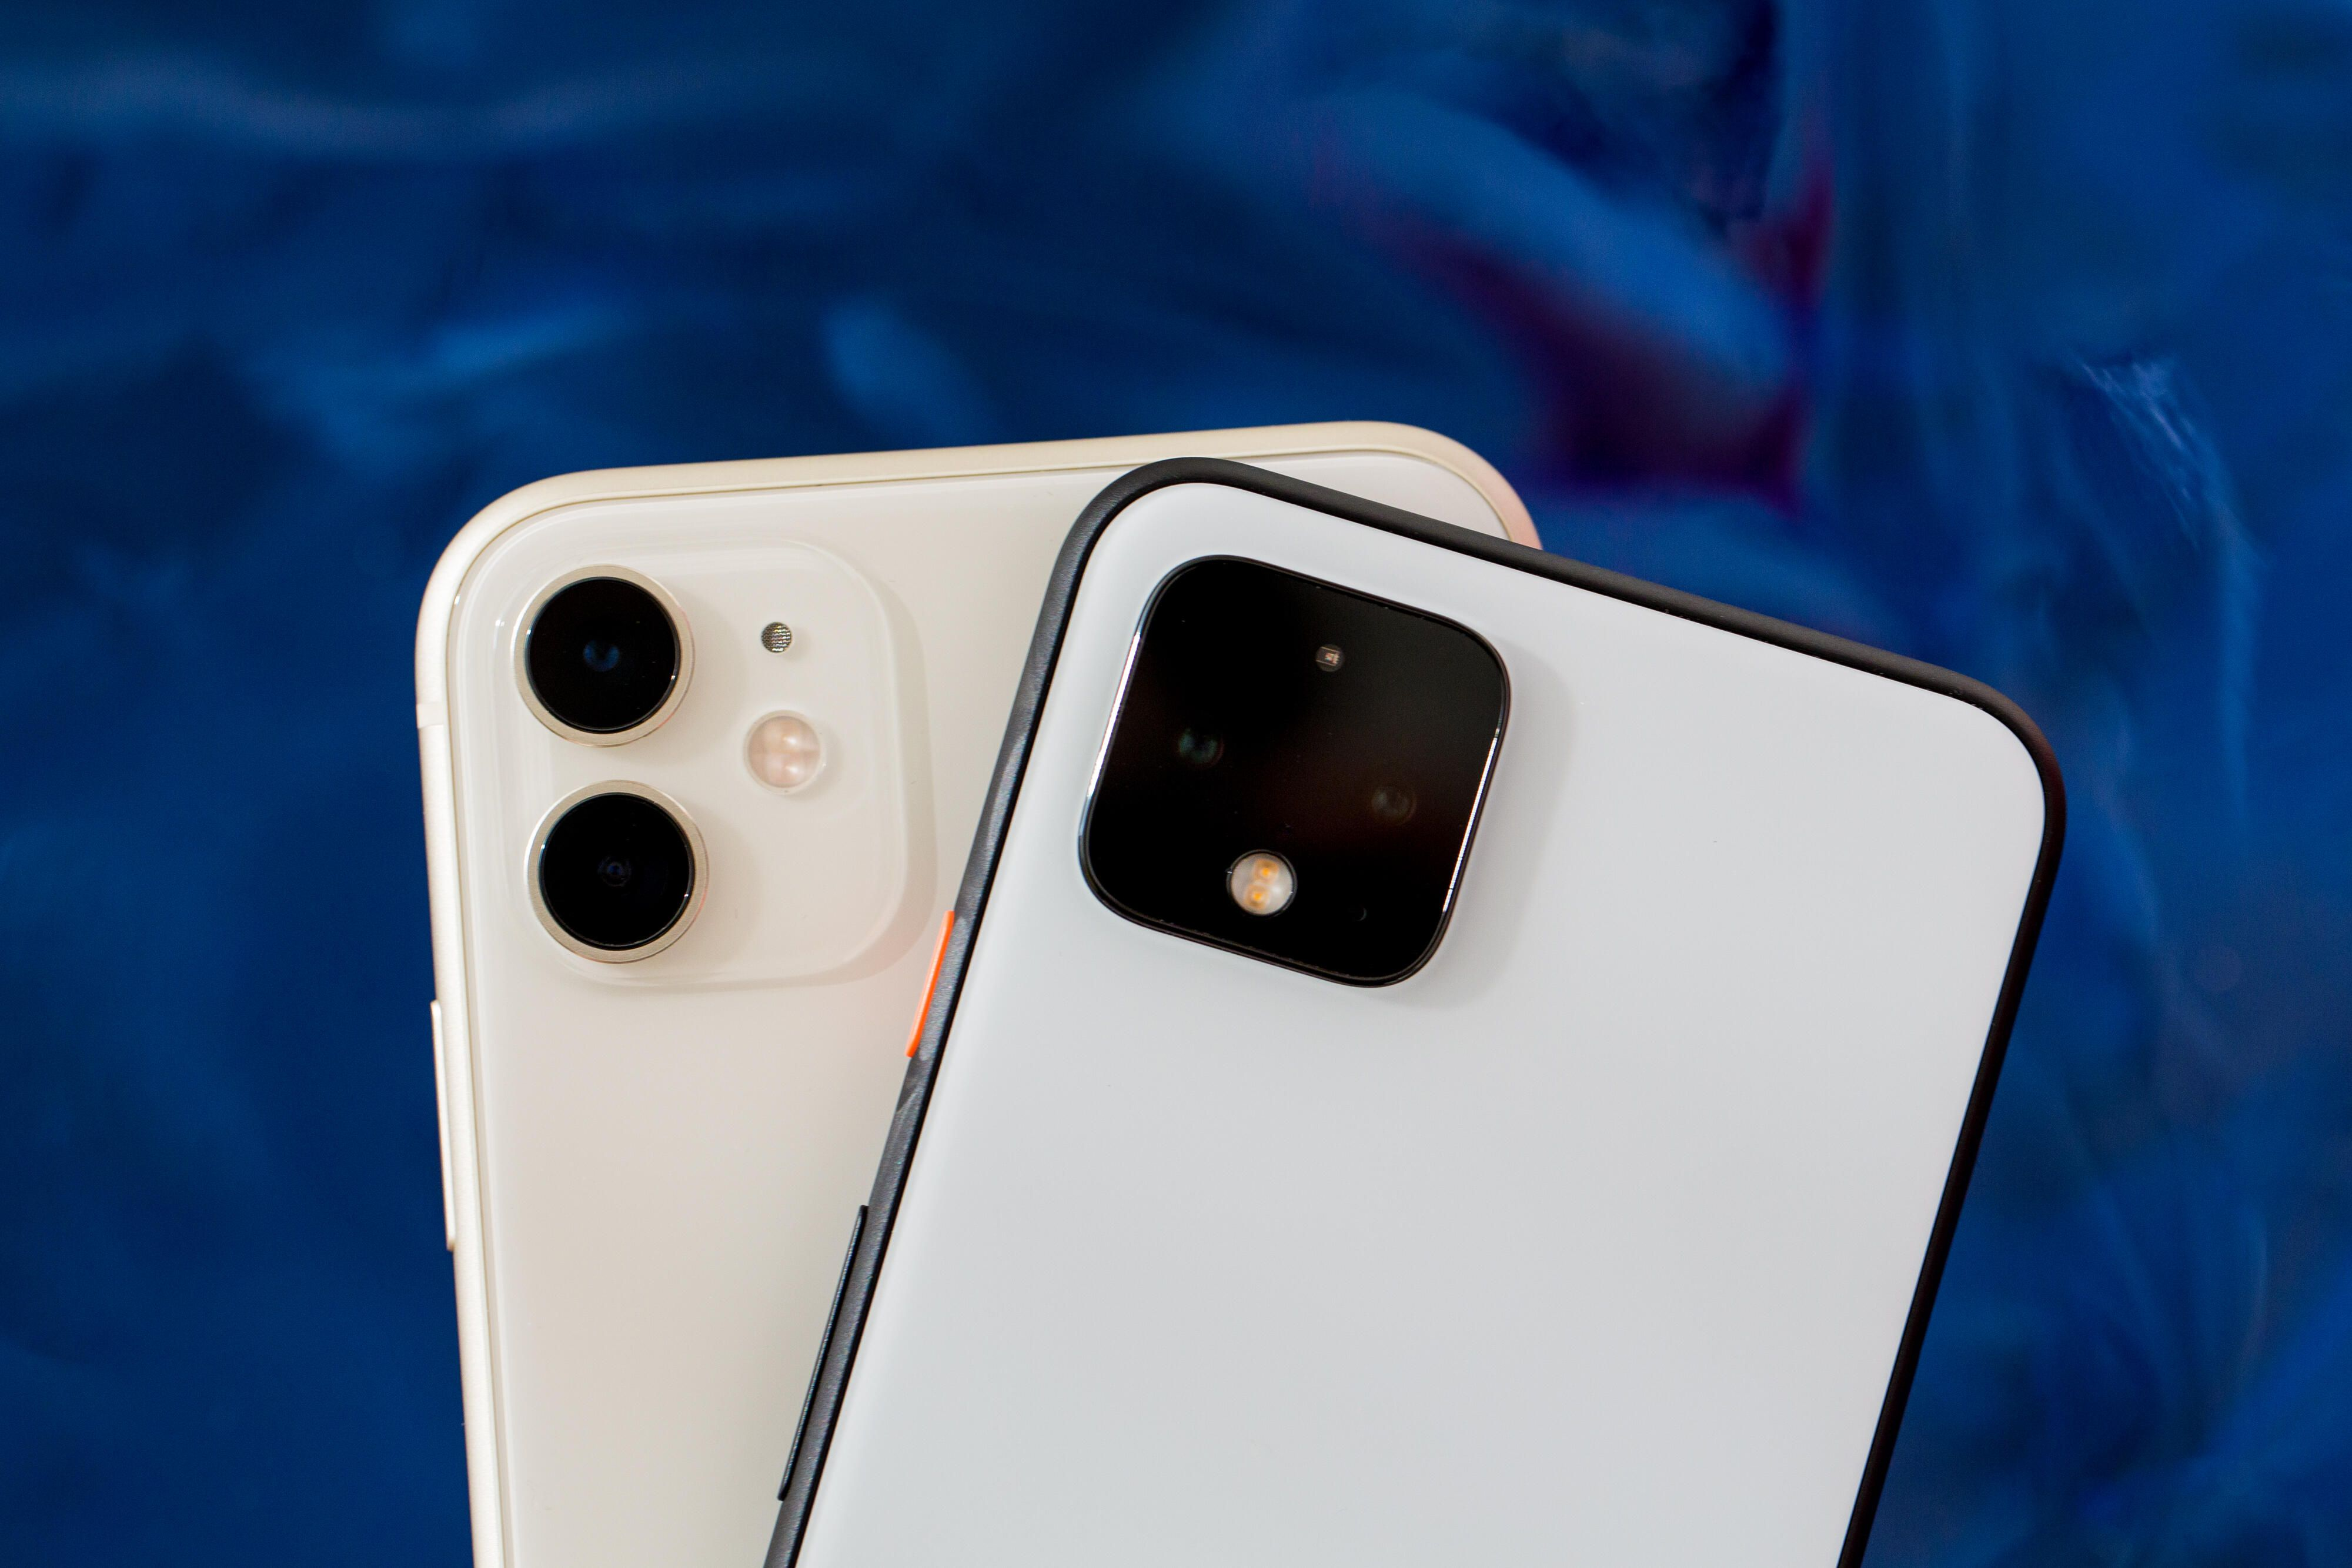 google-pixel-4-vs-apple-iphone-11-3032